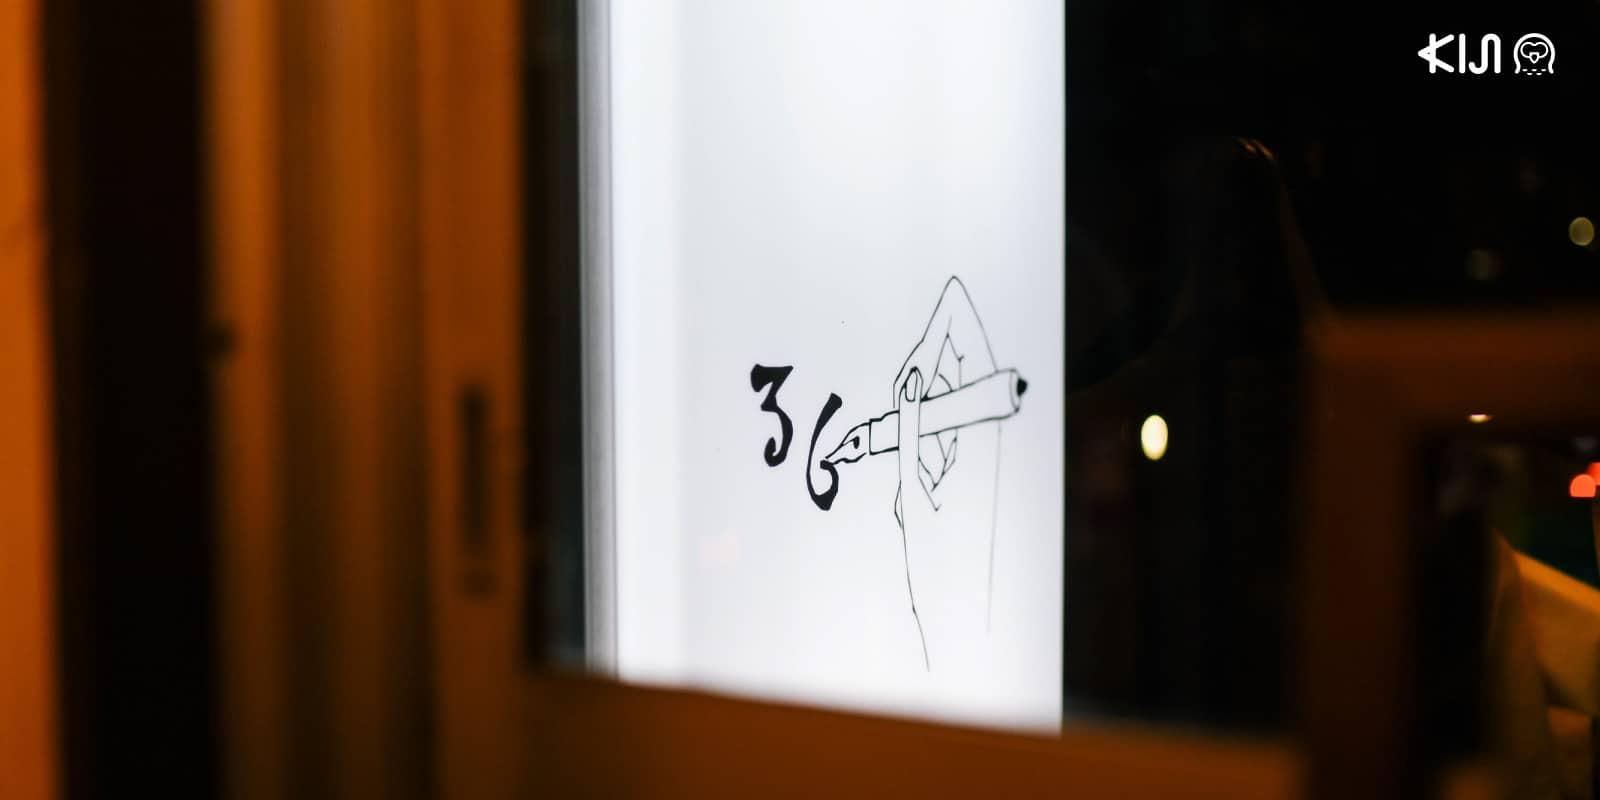 36 Sublo ร้านเครื่องเขียนยุค Old School ในญี่ปุ่น